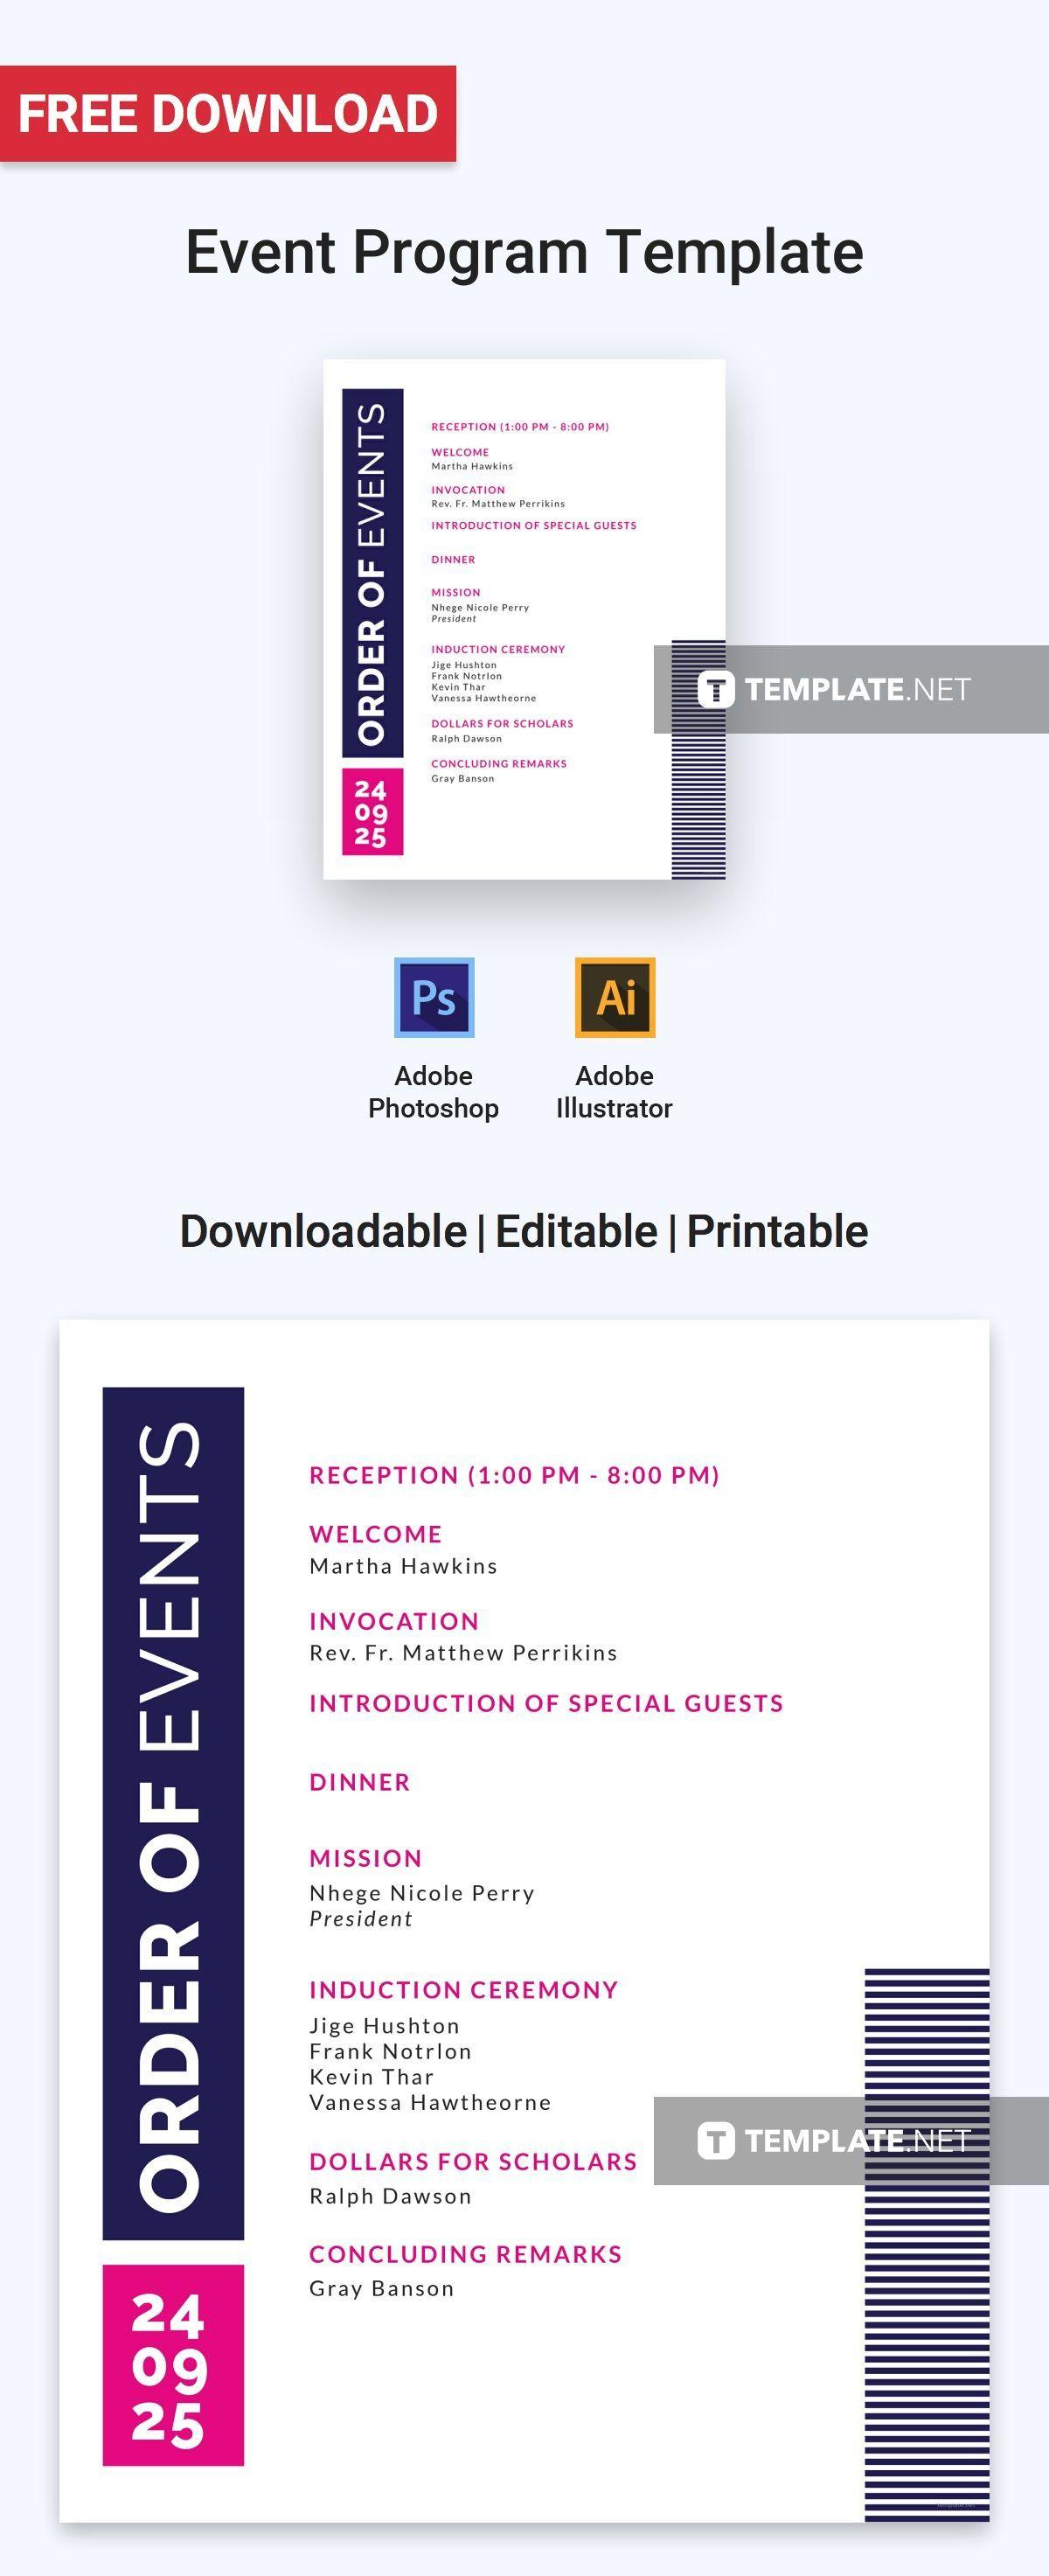 Free Event Program Invitation Program Templates Designs Within Free Event Program Templates Word Event Program Free Program Templates Program Template Schedule of events template word